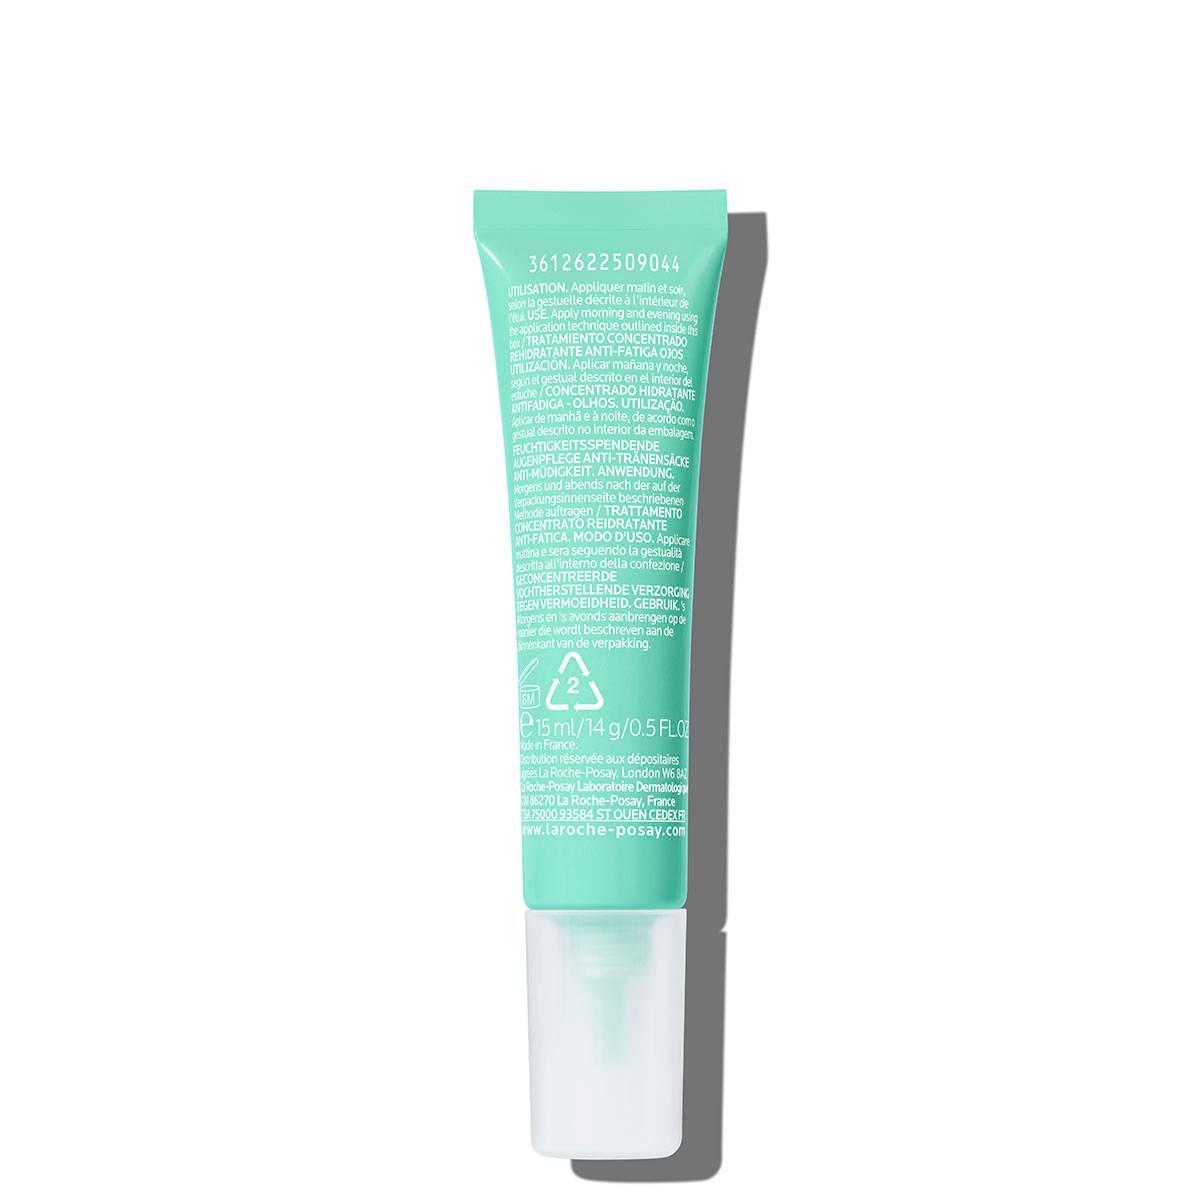 LaRochePosay-ProductPage-Moisturiser-Hydraphase-HA-Eyes-15ml-3337872412646-BSS